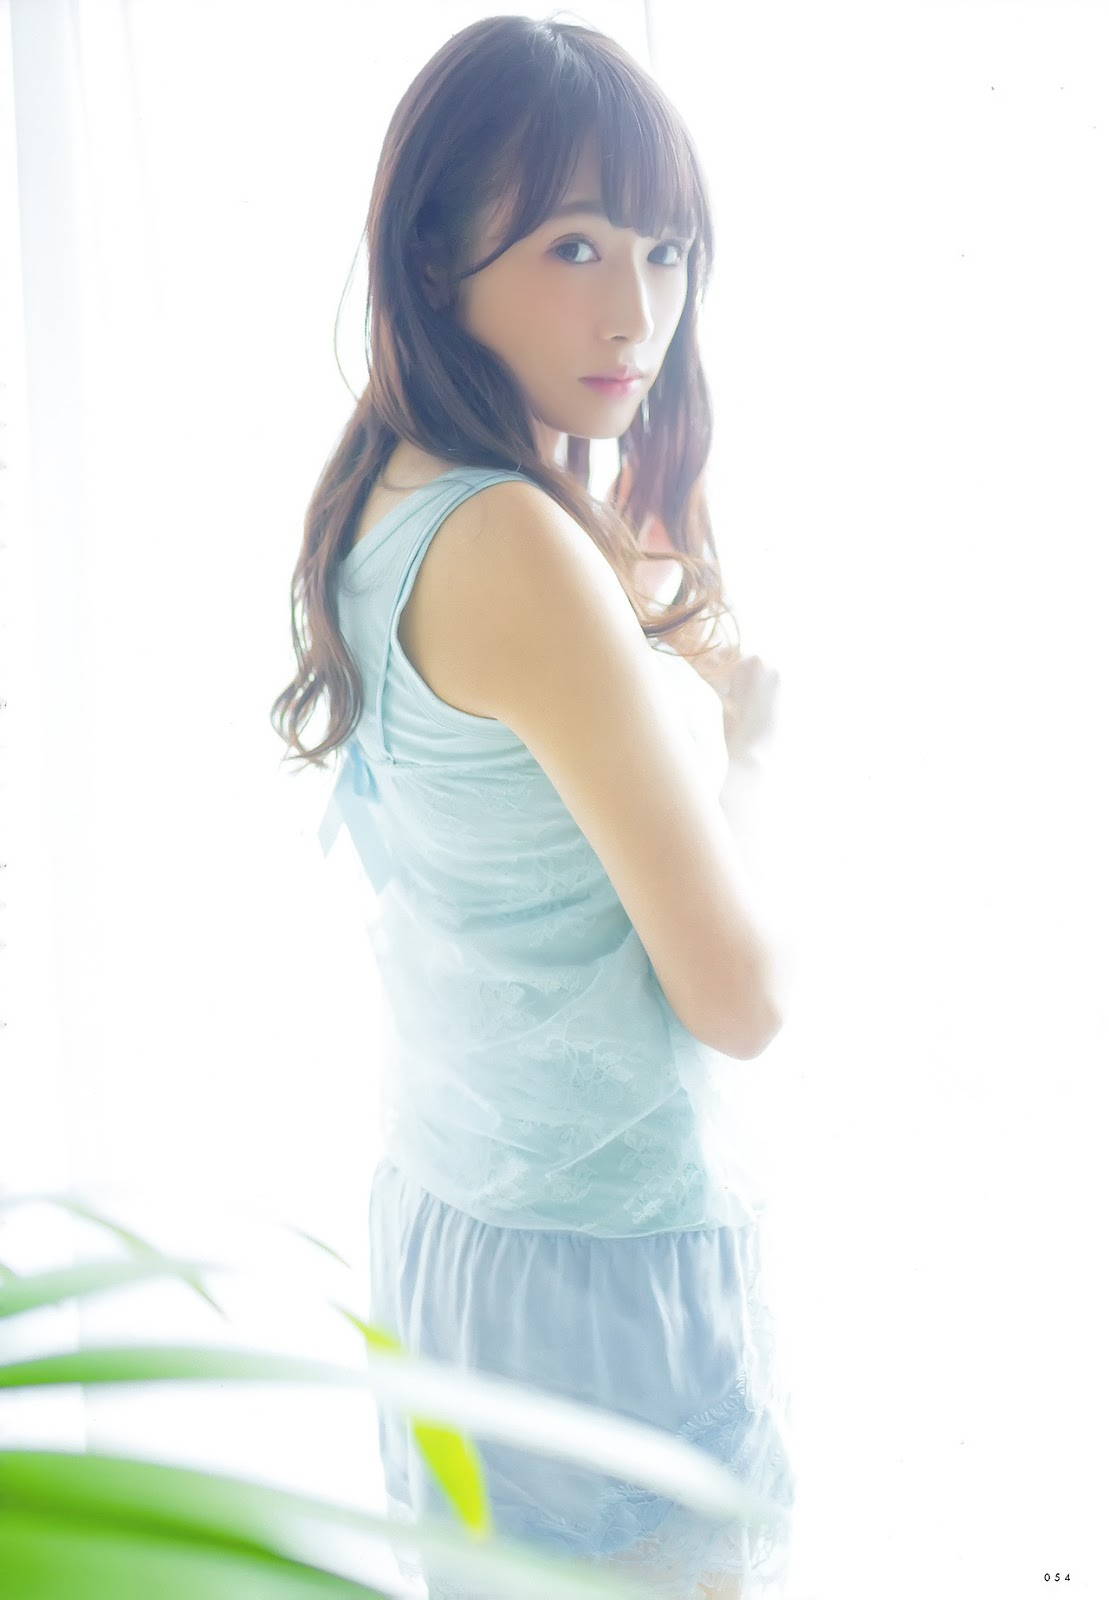 Nao Kanzaki and a few friends: Keyakizaka46: The 'Rika